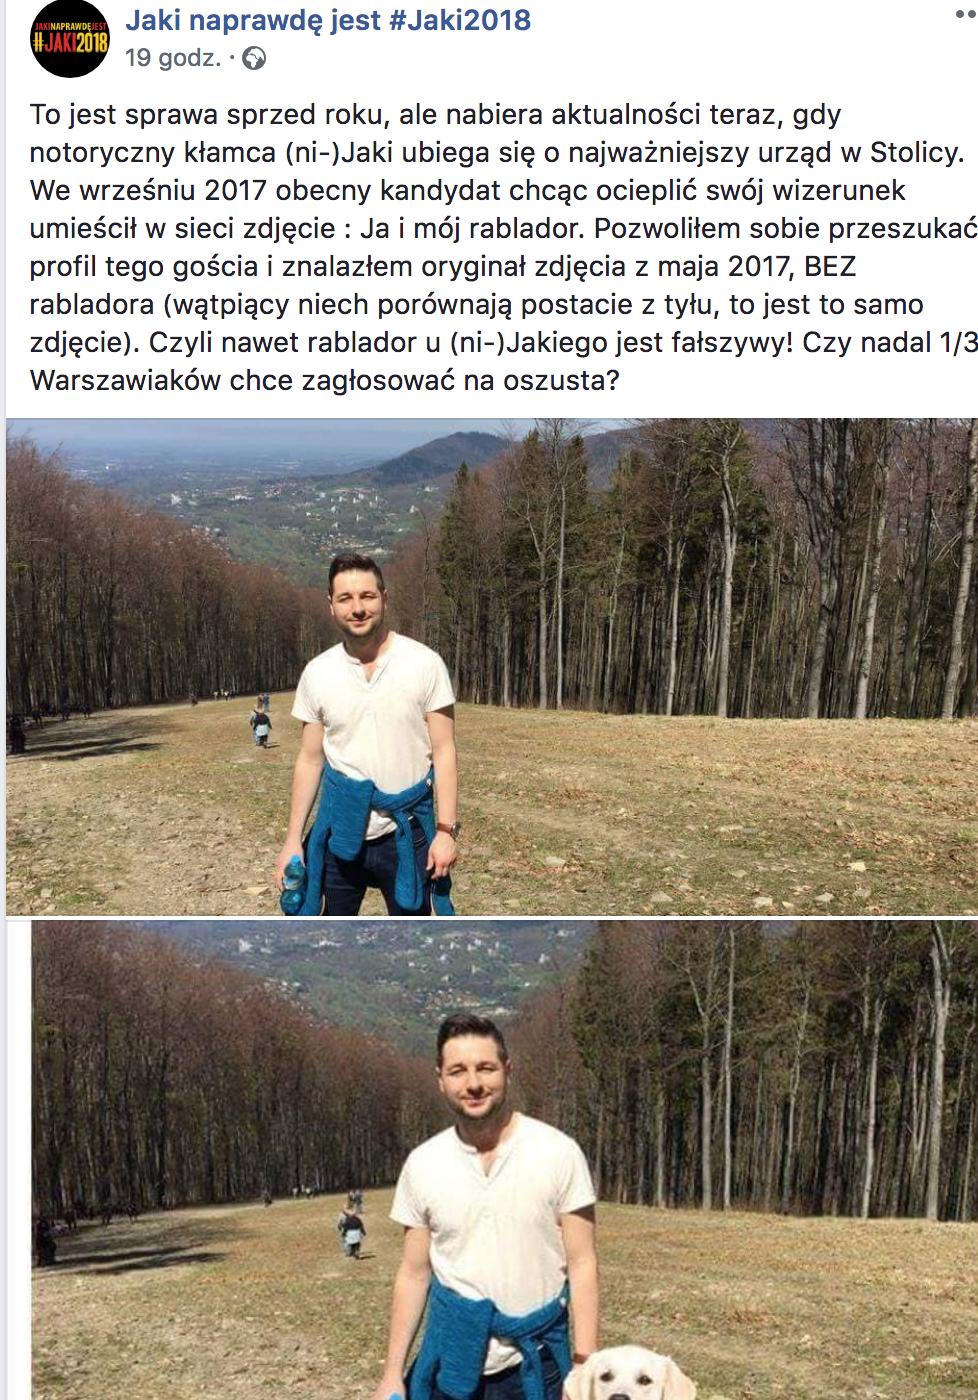 patryk-jaki-fake-news